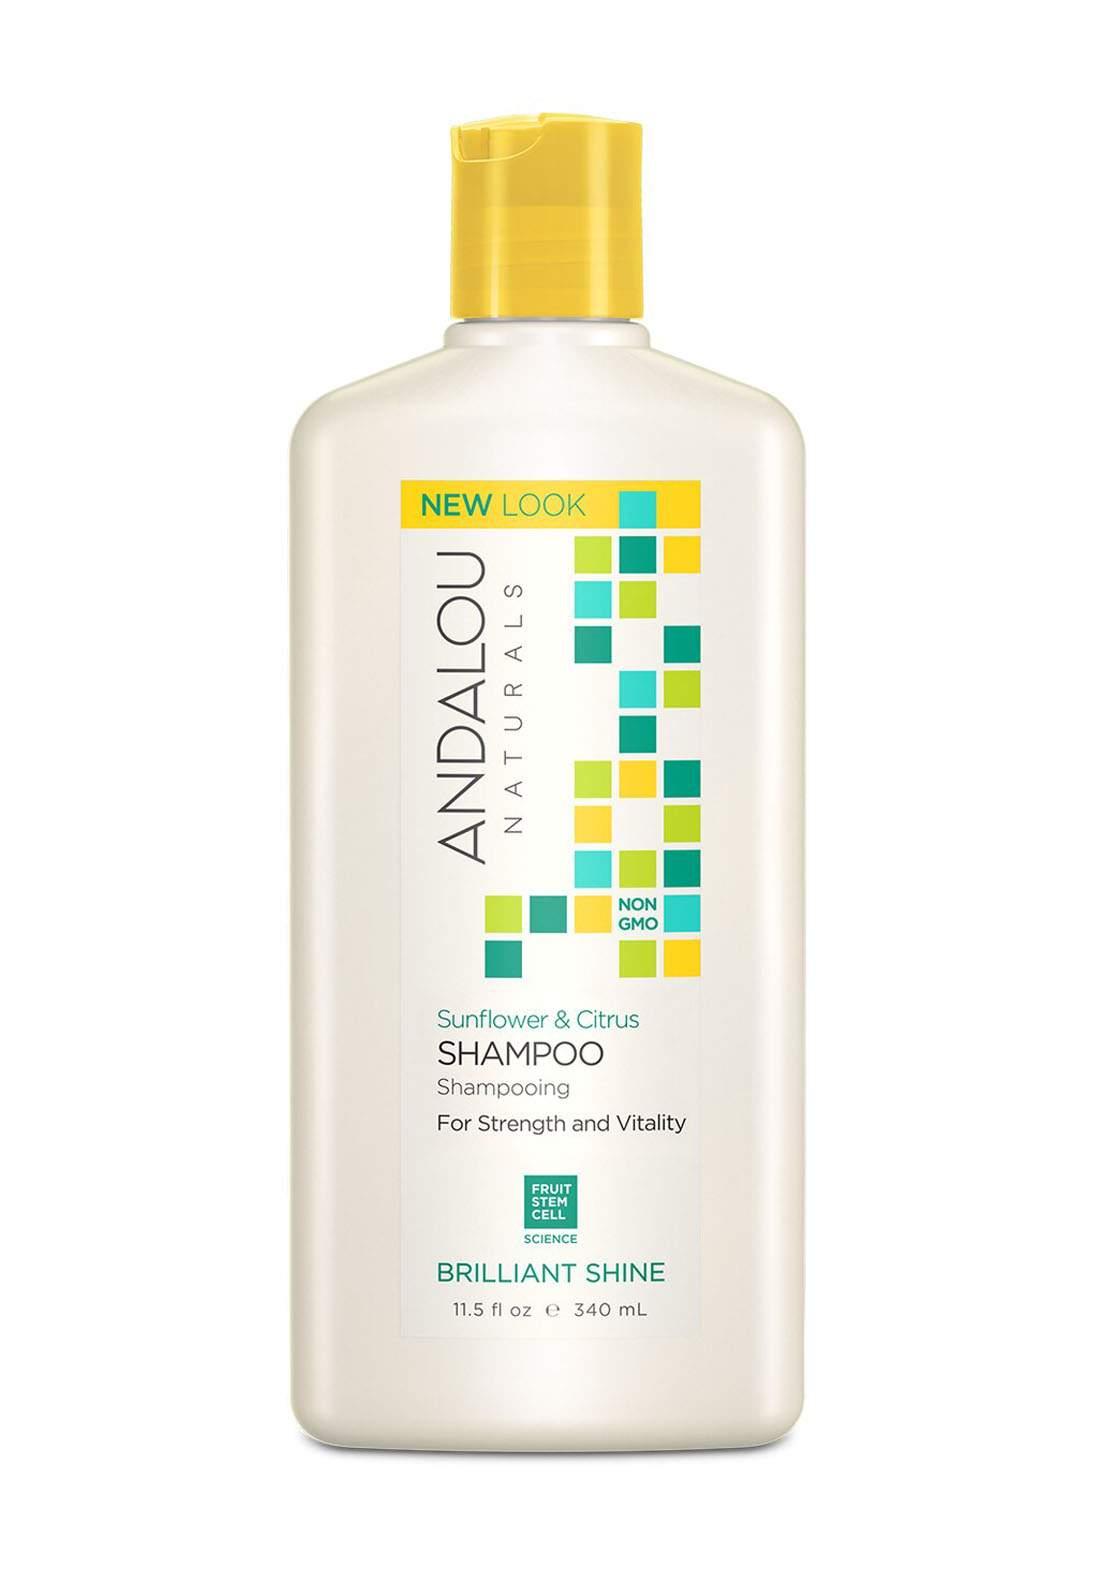 27101 Andalou Naturals Sunflower And Citrus Brilliant Shine Shampoo 340ml شامبو للشعر